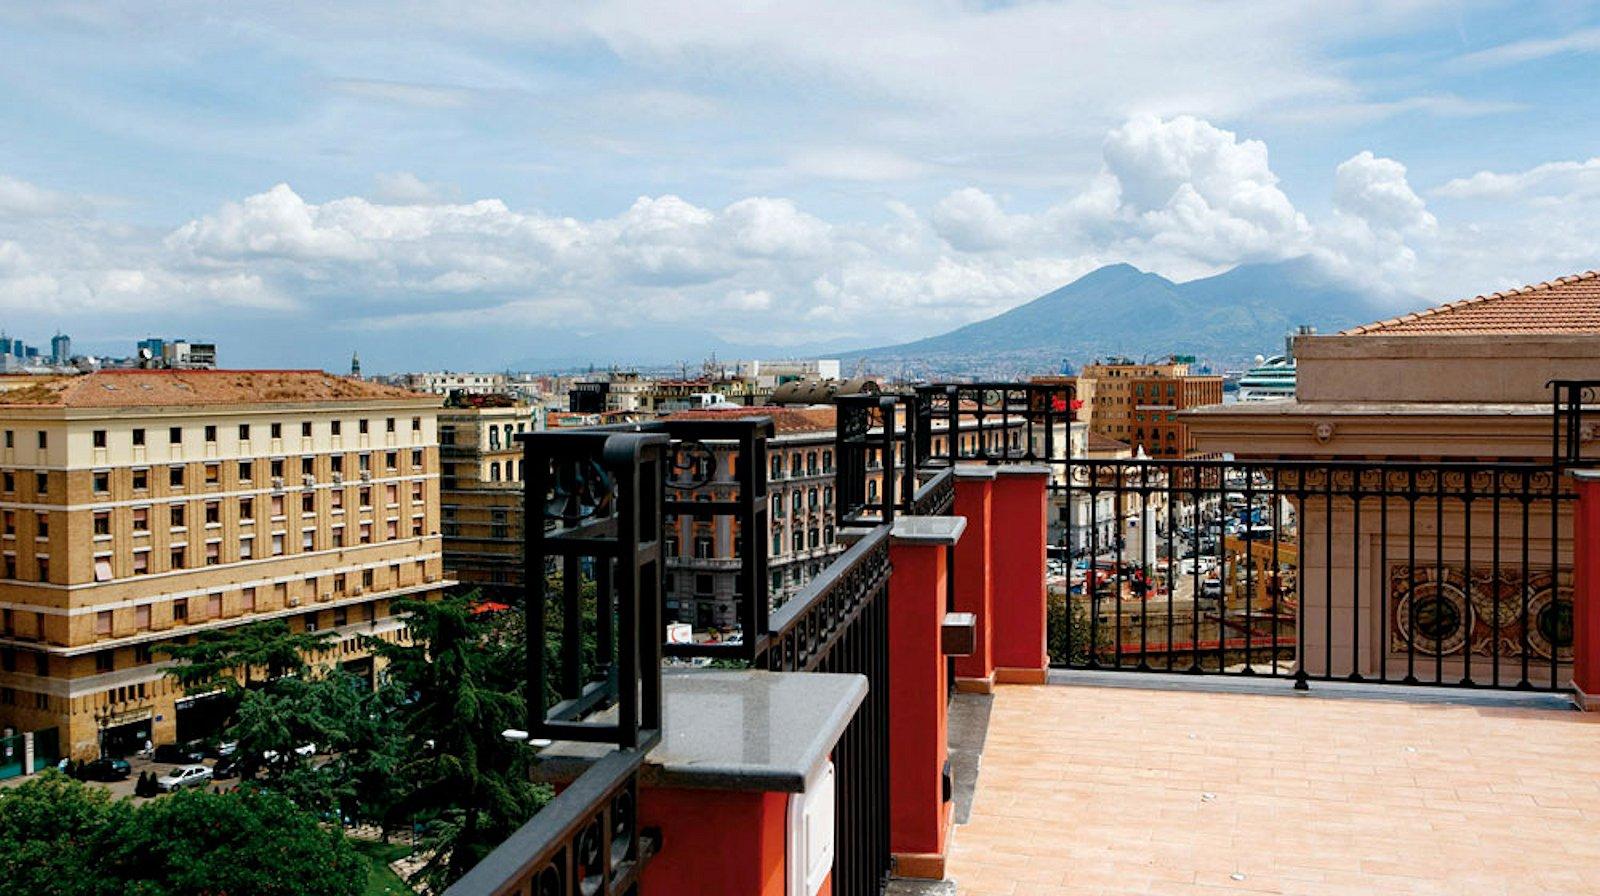 la ciliegina lifestyle hotel naples centre italie hotel 4 toiles naples. Black Bedroom Furniture Sets. Home Design Ideas